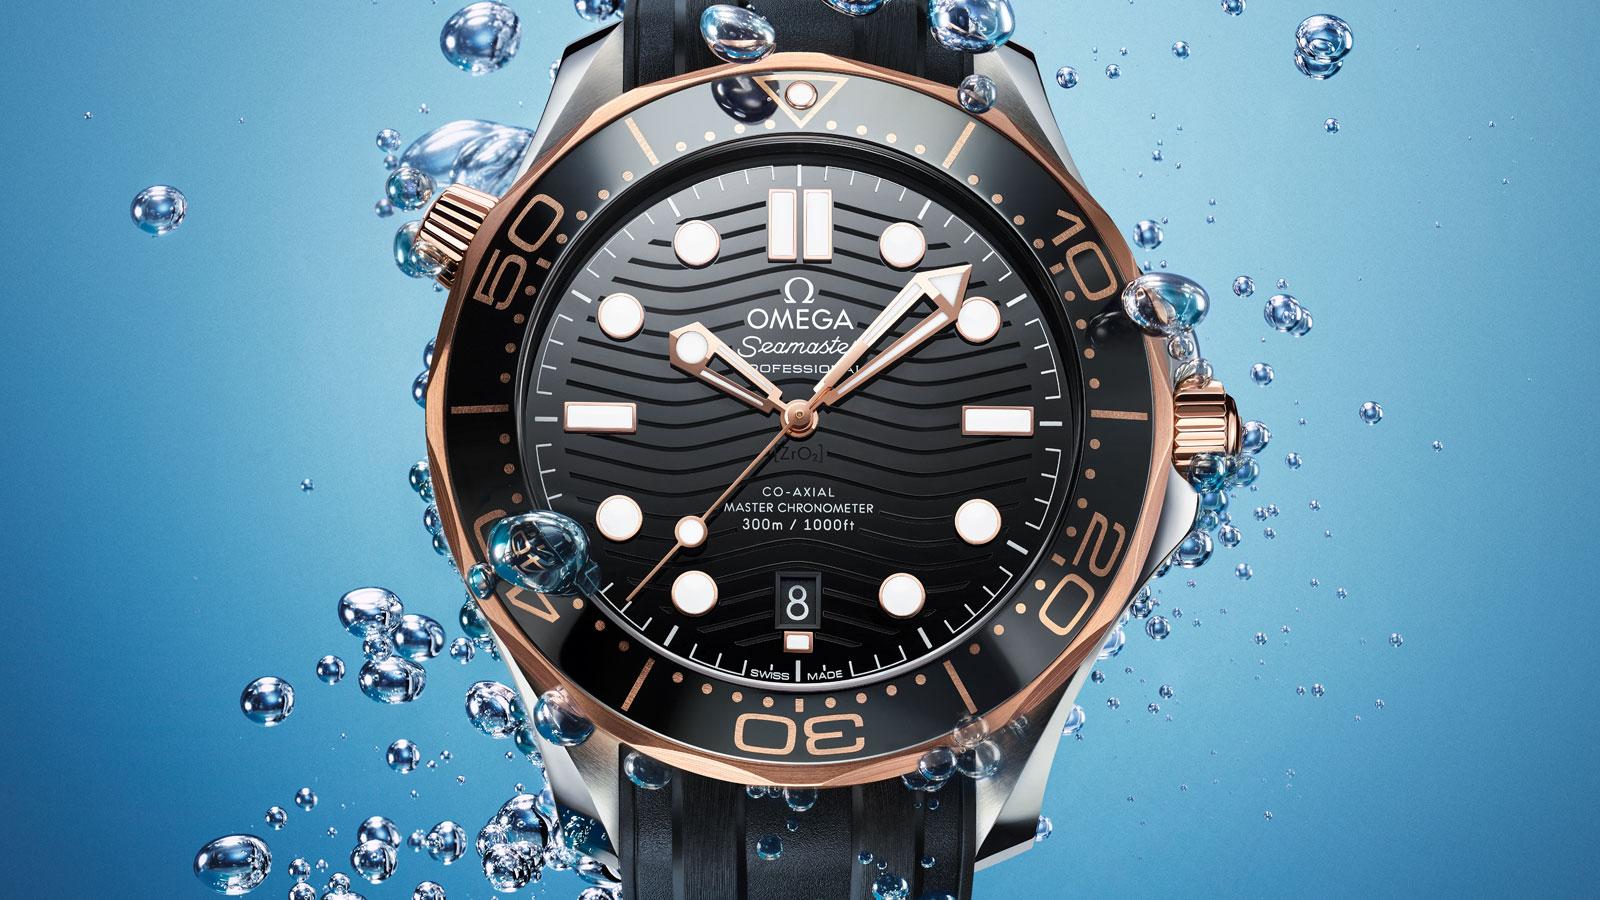 Seamaster 300米潜水表 300米潜水表 欧米茄至臻天文台表42毫米 腕表 - 210.22.42.20.01.002